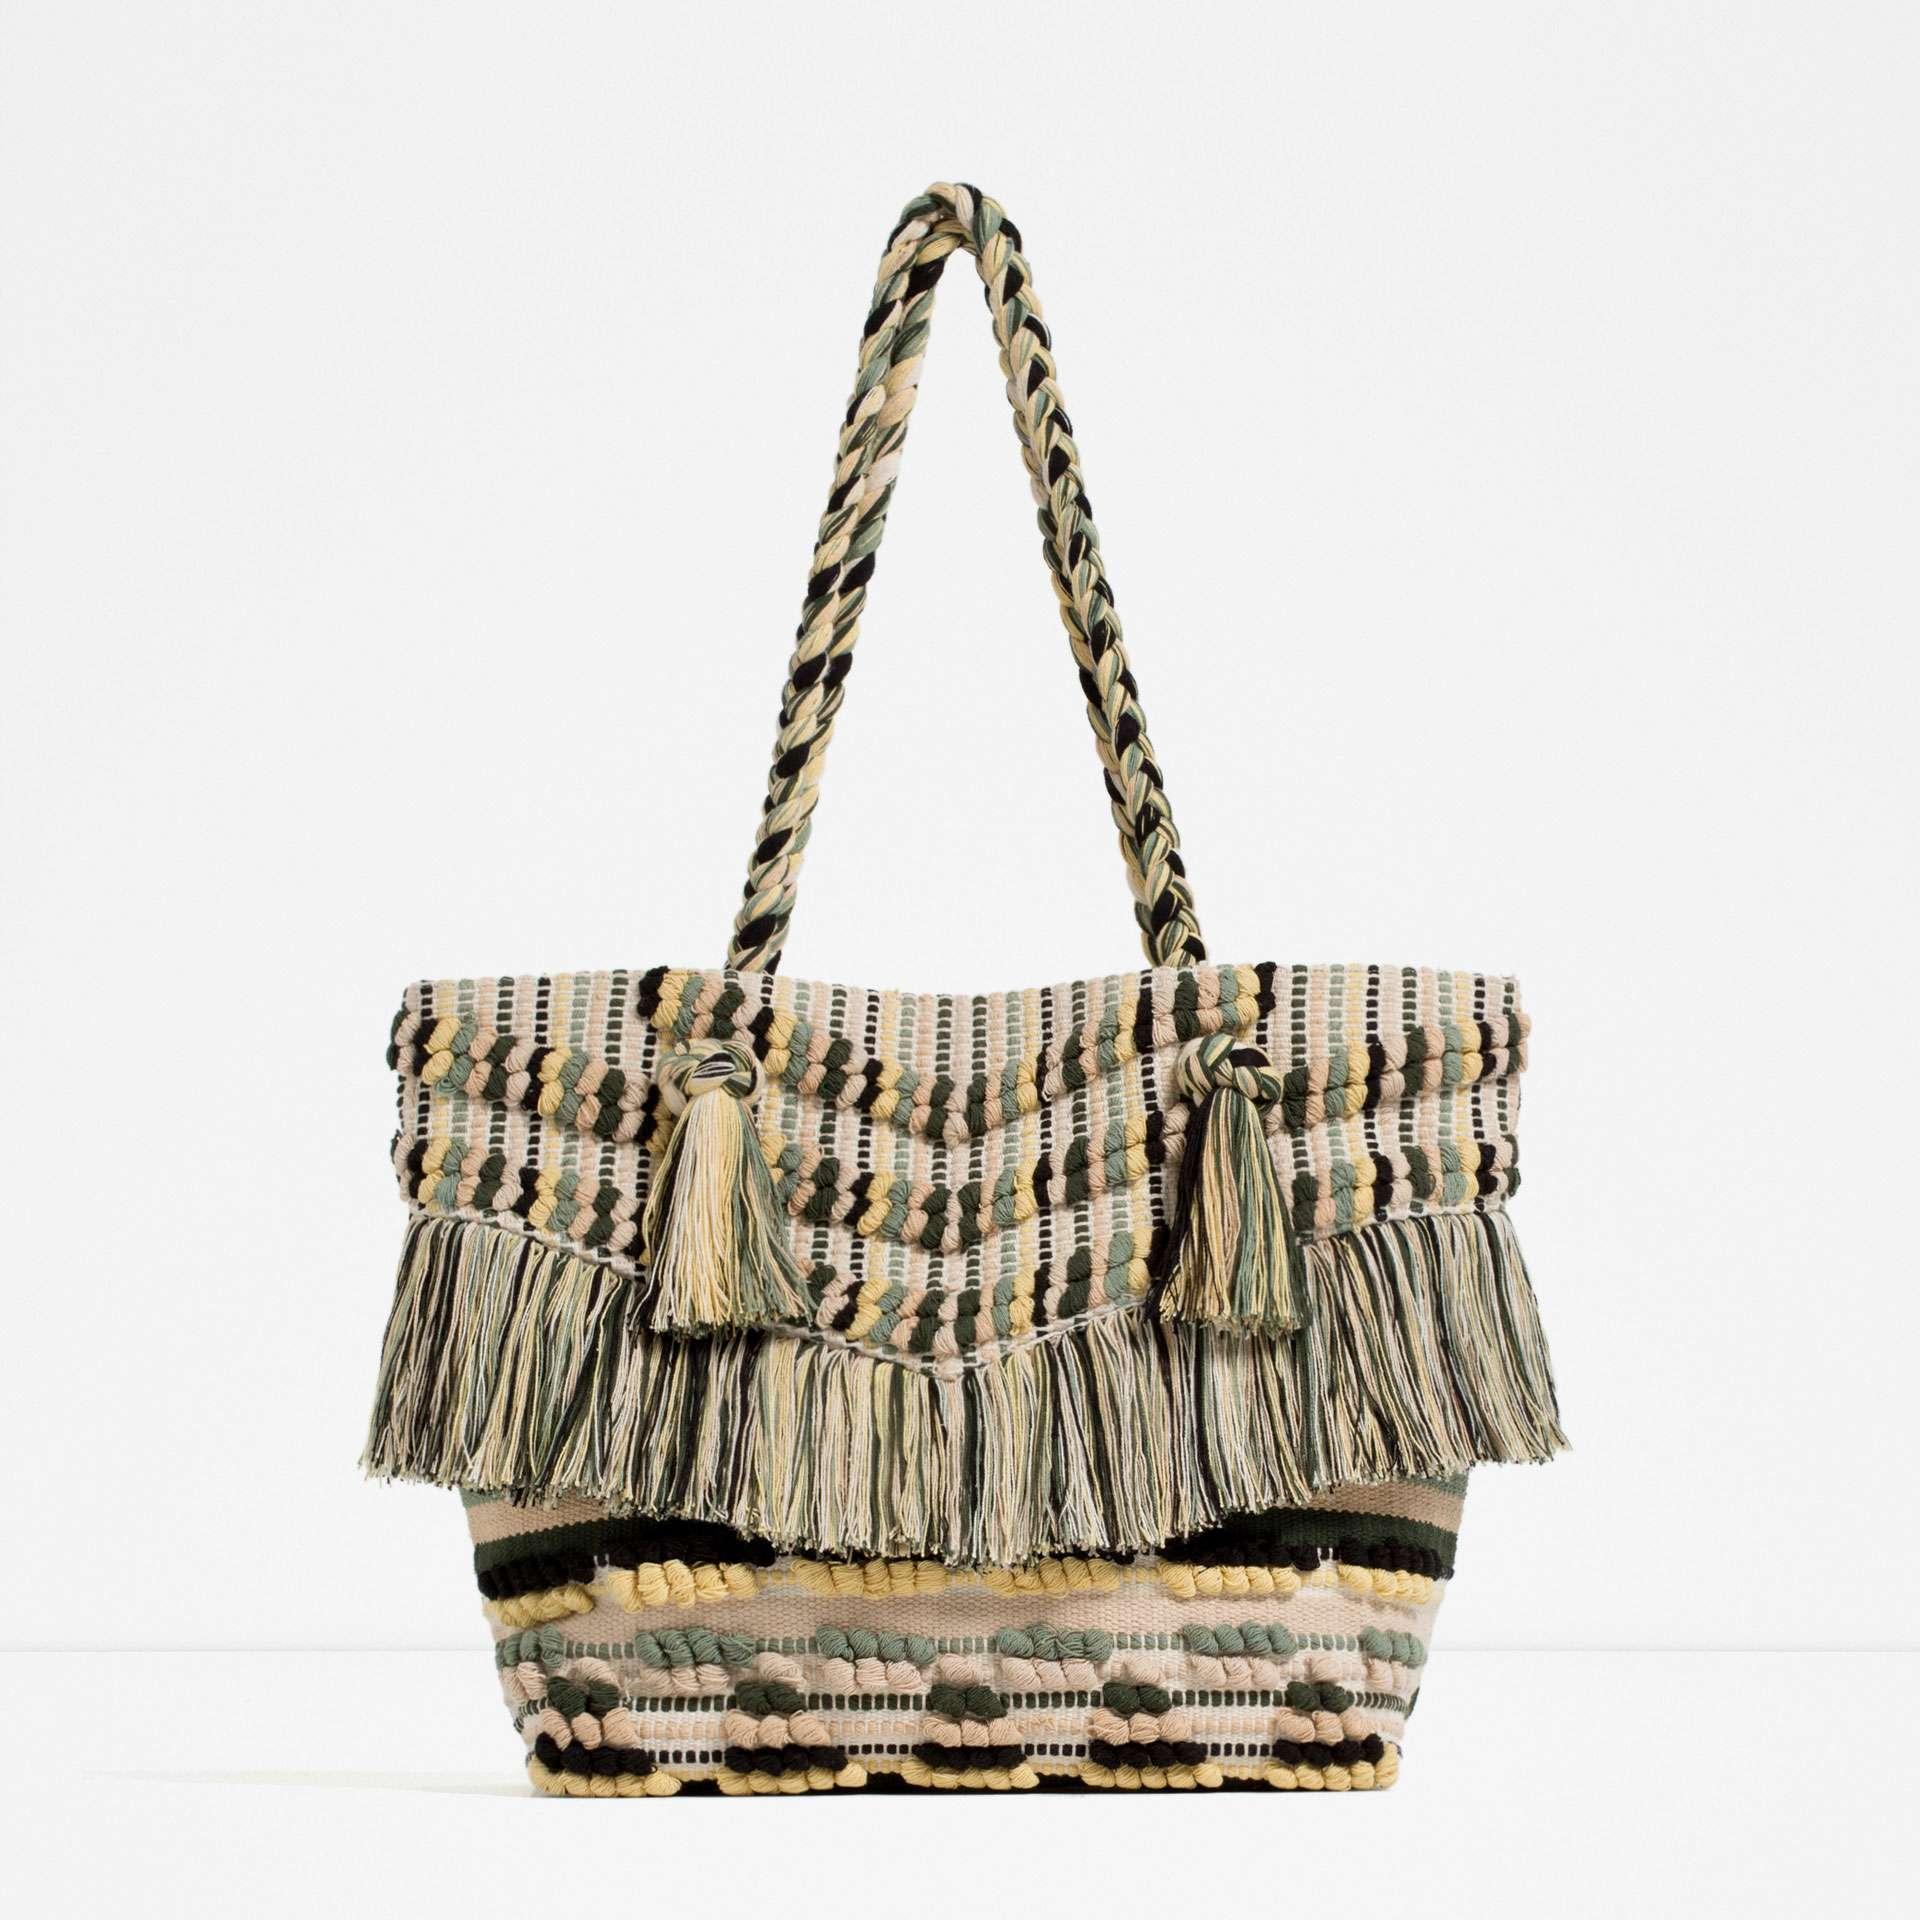 bolsas de playa 2016 - zara 2